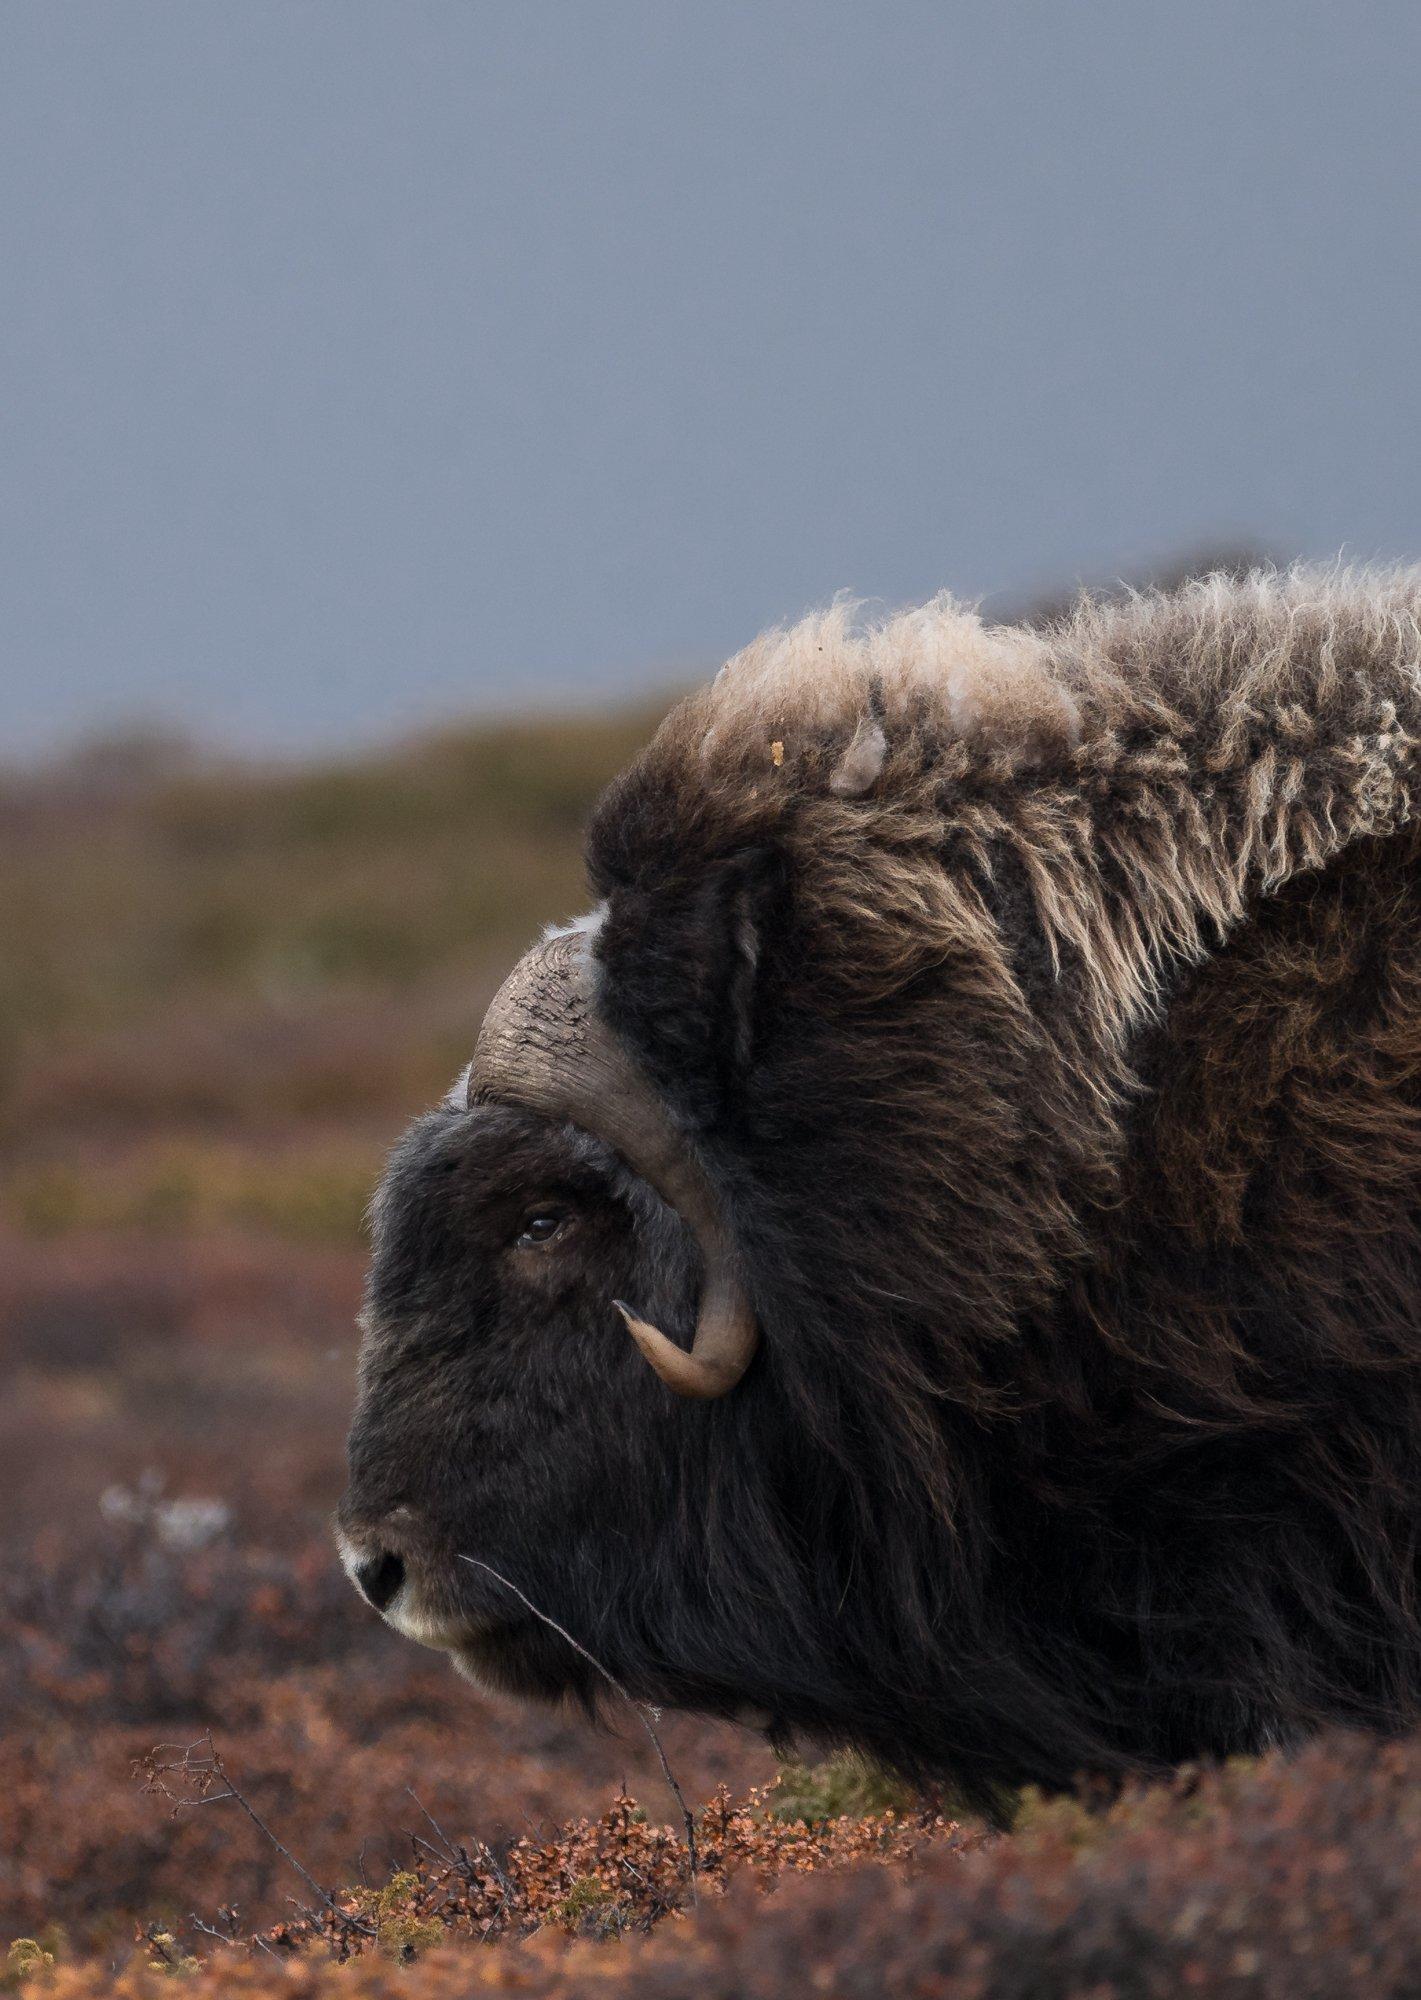 musk ox, animals, norway, dovre, landscape, autumn, Sylwia Grabinska